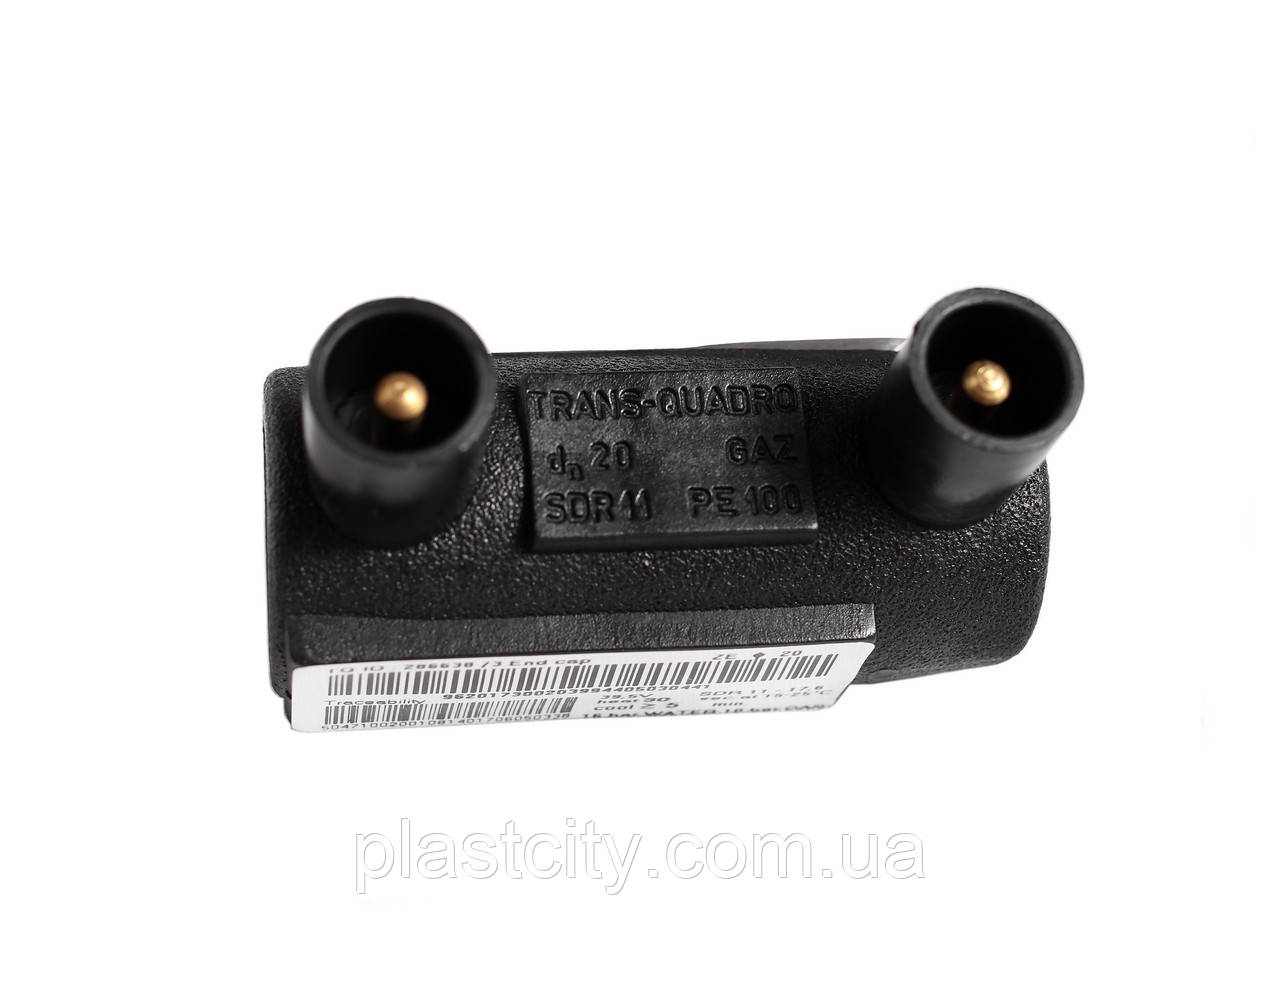 Муфта терморезисторная 280 мм ПЭ100 SDR11